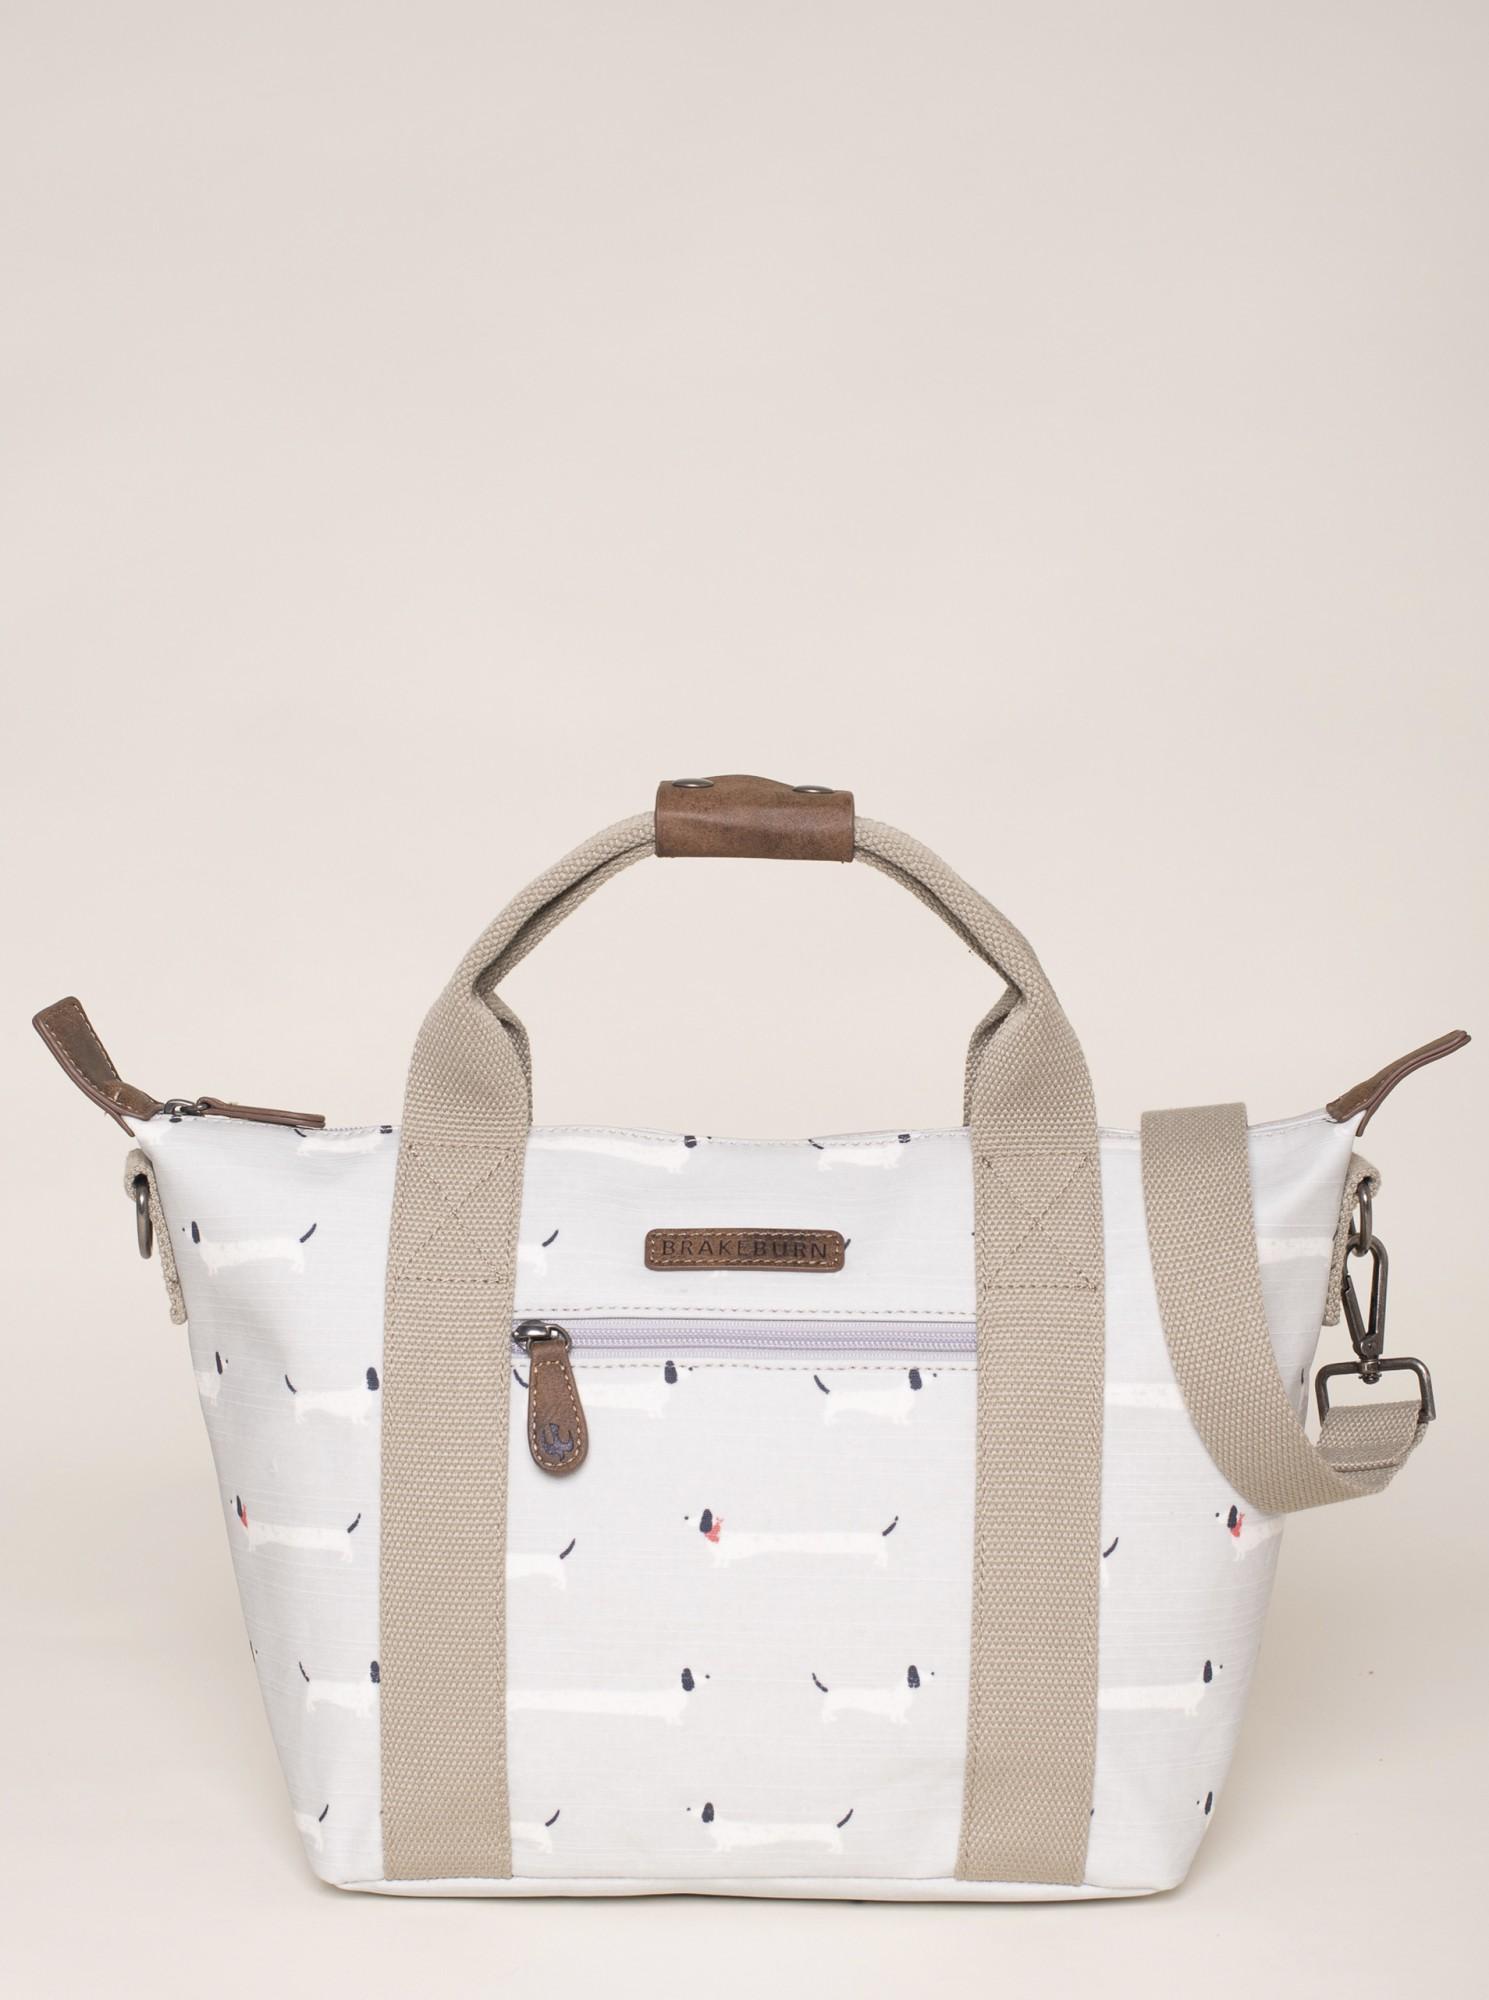 Brakeburn handbag